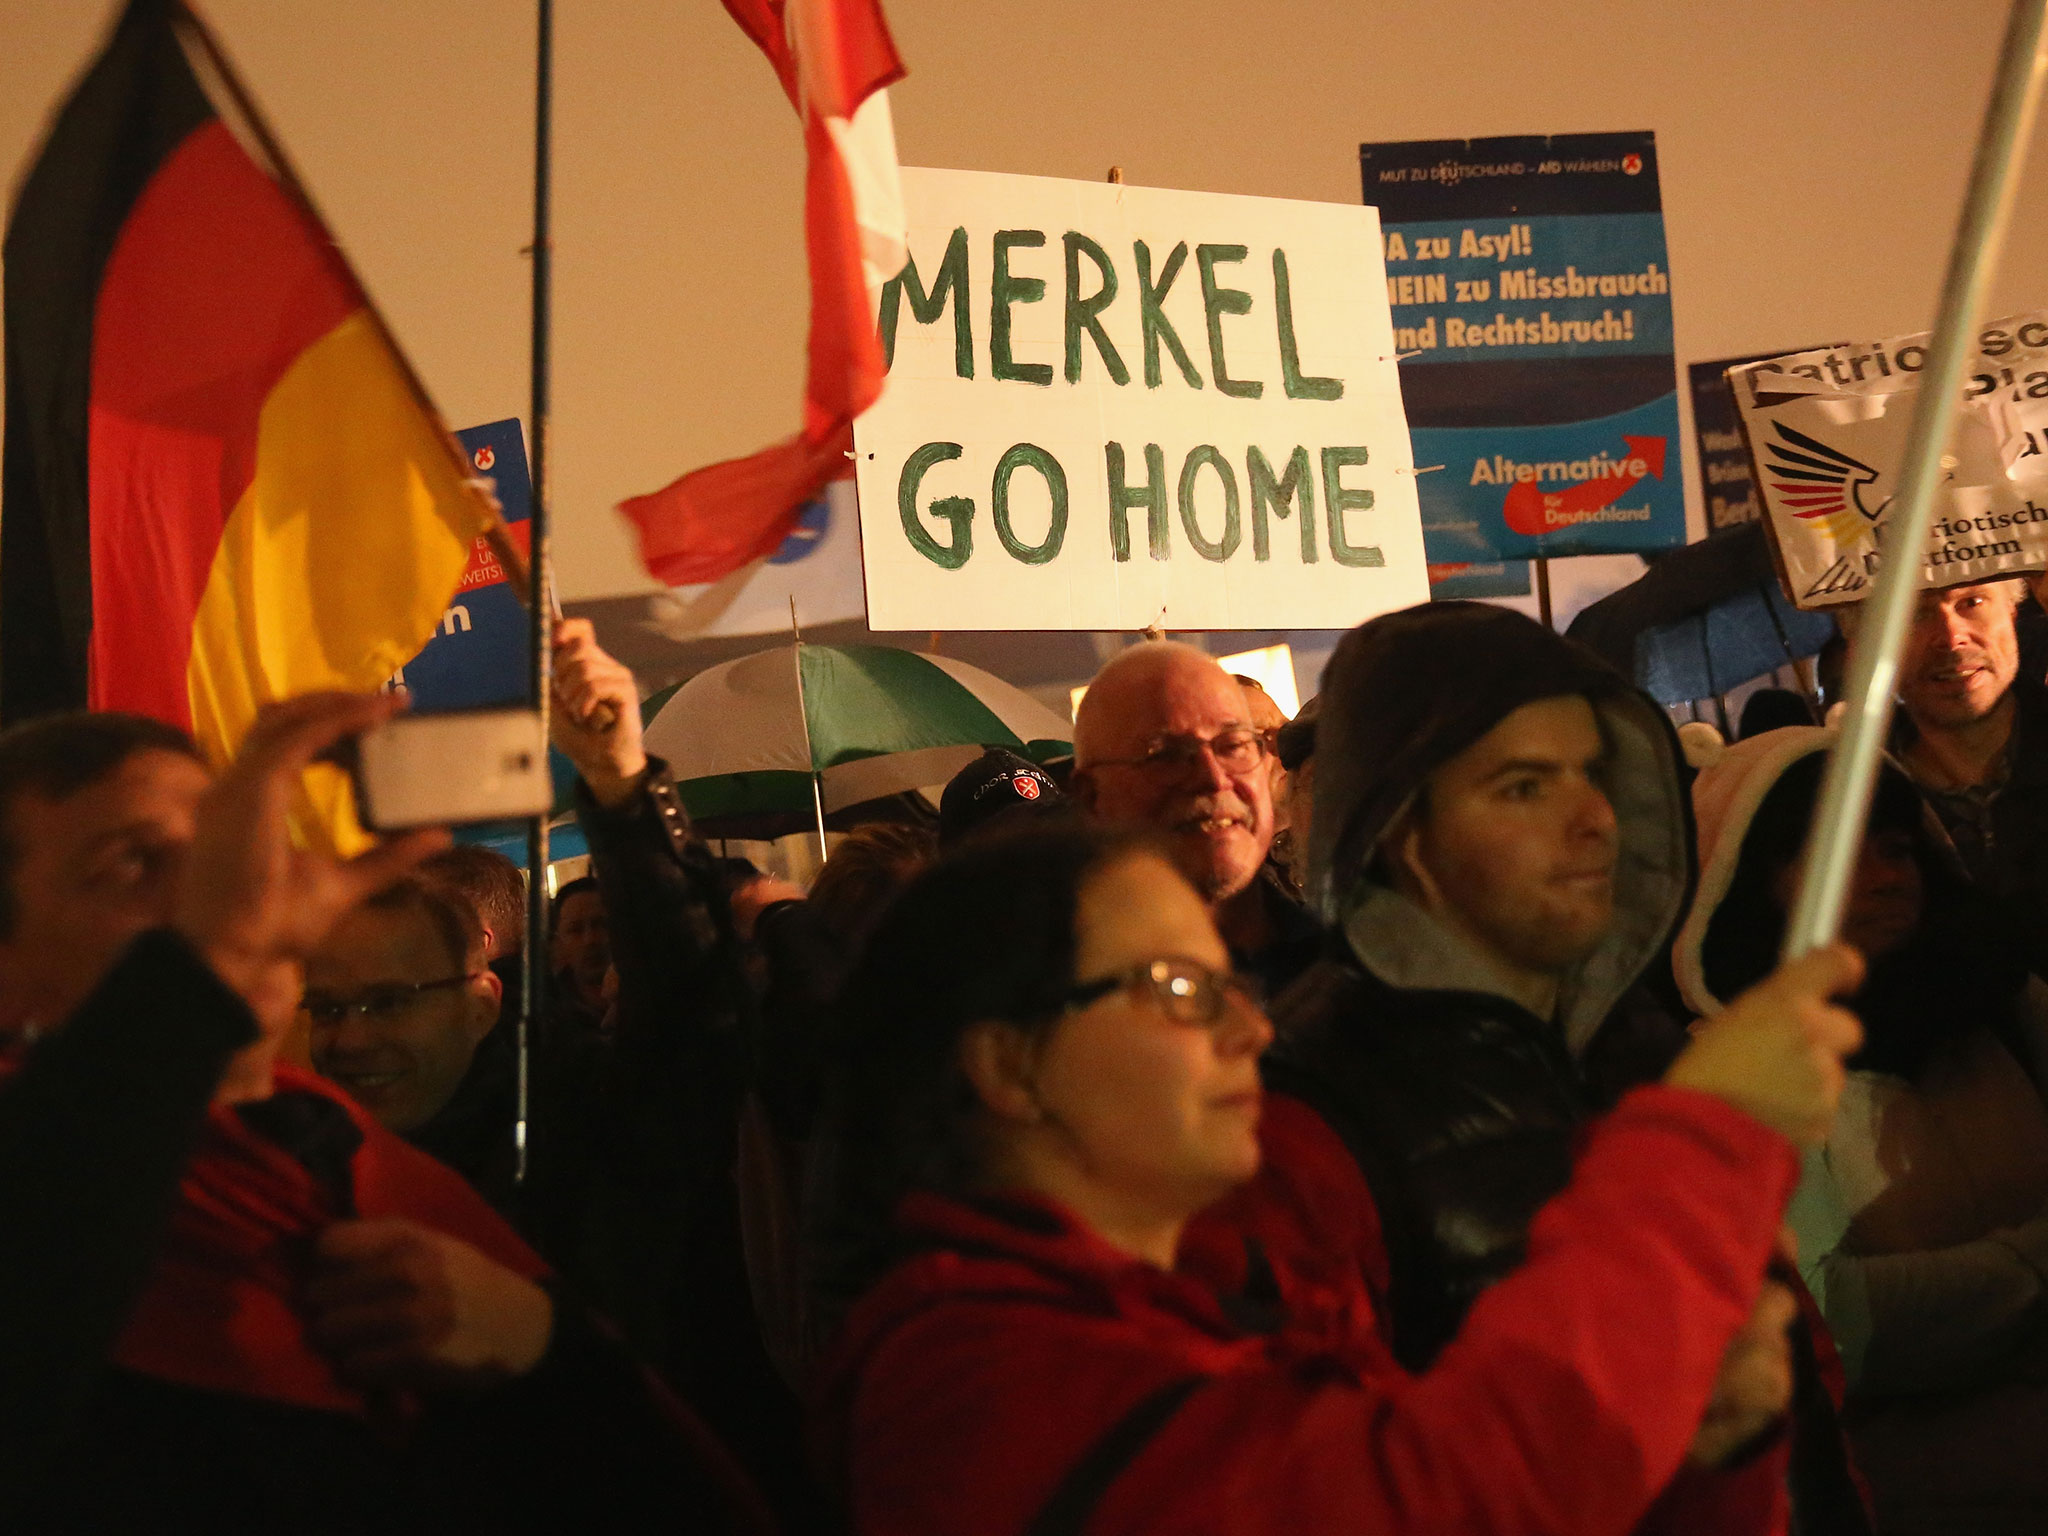 Elezioni in Pomerania, sondaggi: batosta in arrivo per la Merkel